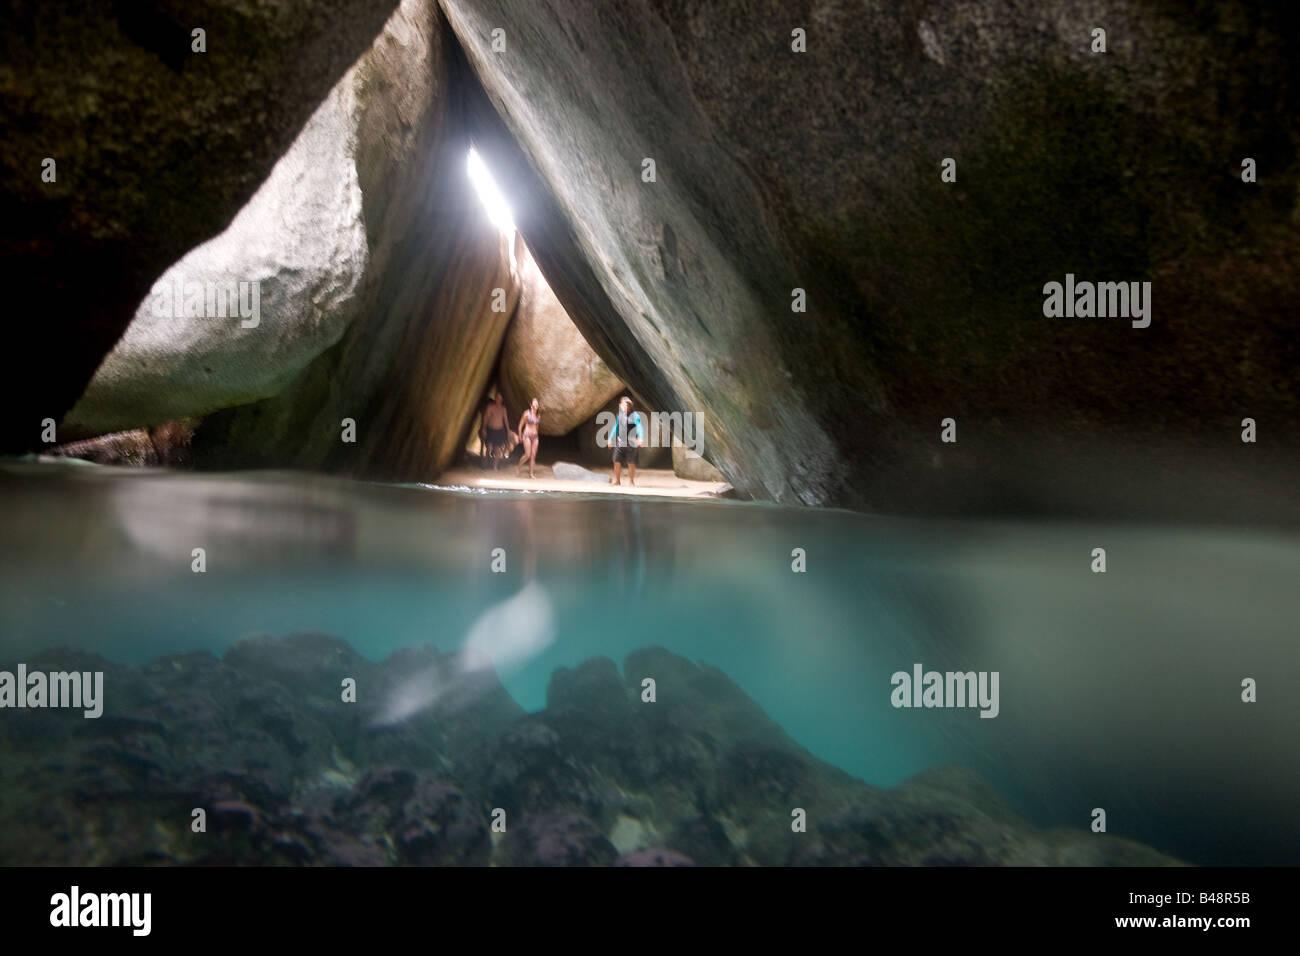 Inside of 'The Baths' on Virgin Gorda, British Virgin Islands - Stock Image